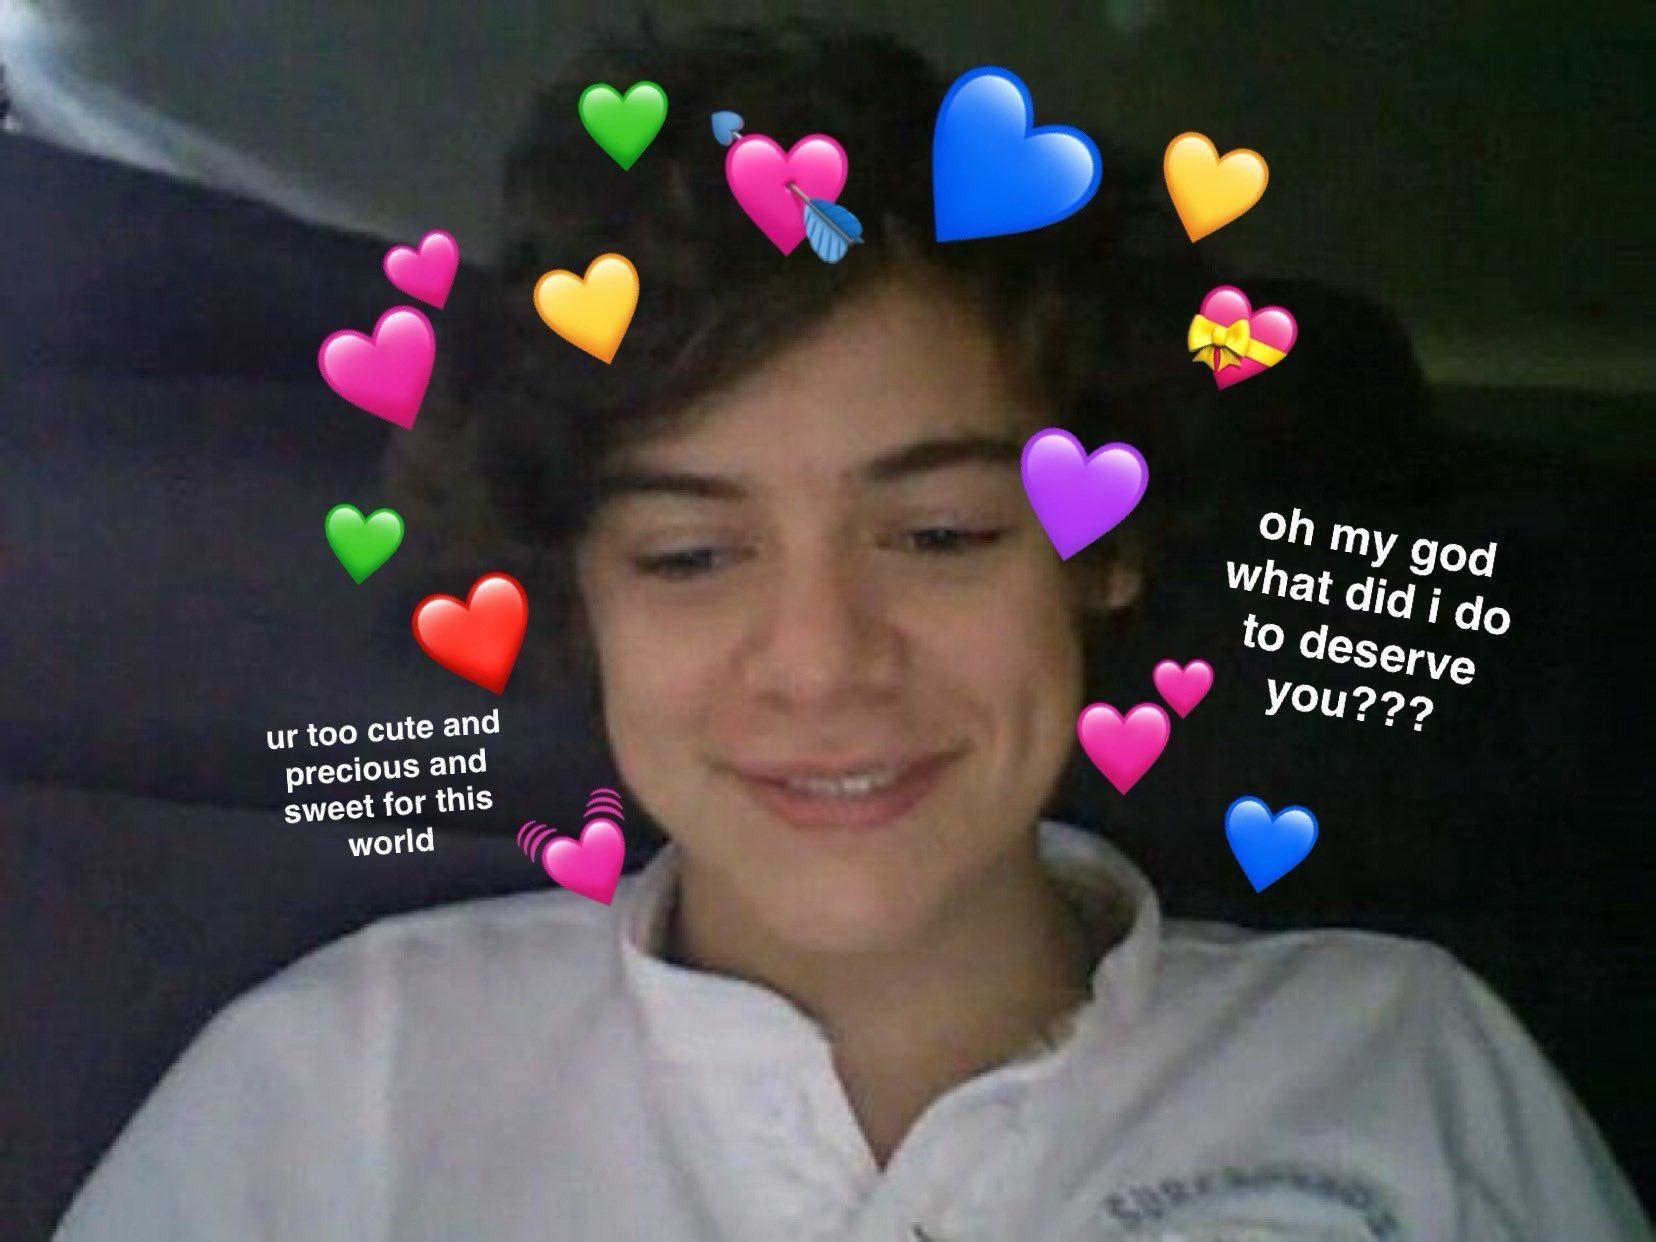 Pin De Kyung Saa Em One Dead Memes De Amor Memes Apaixonados One Direction Fotos